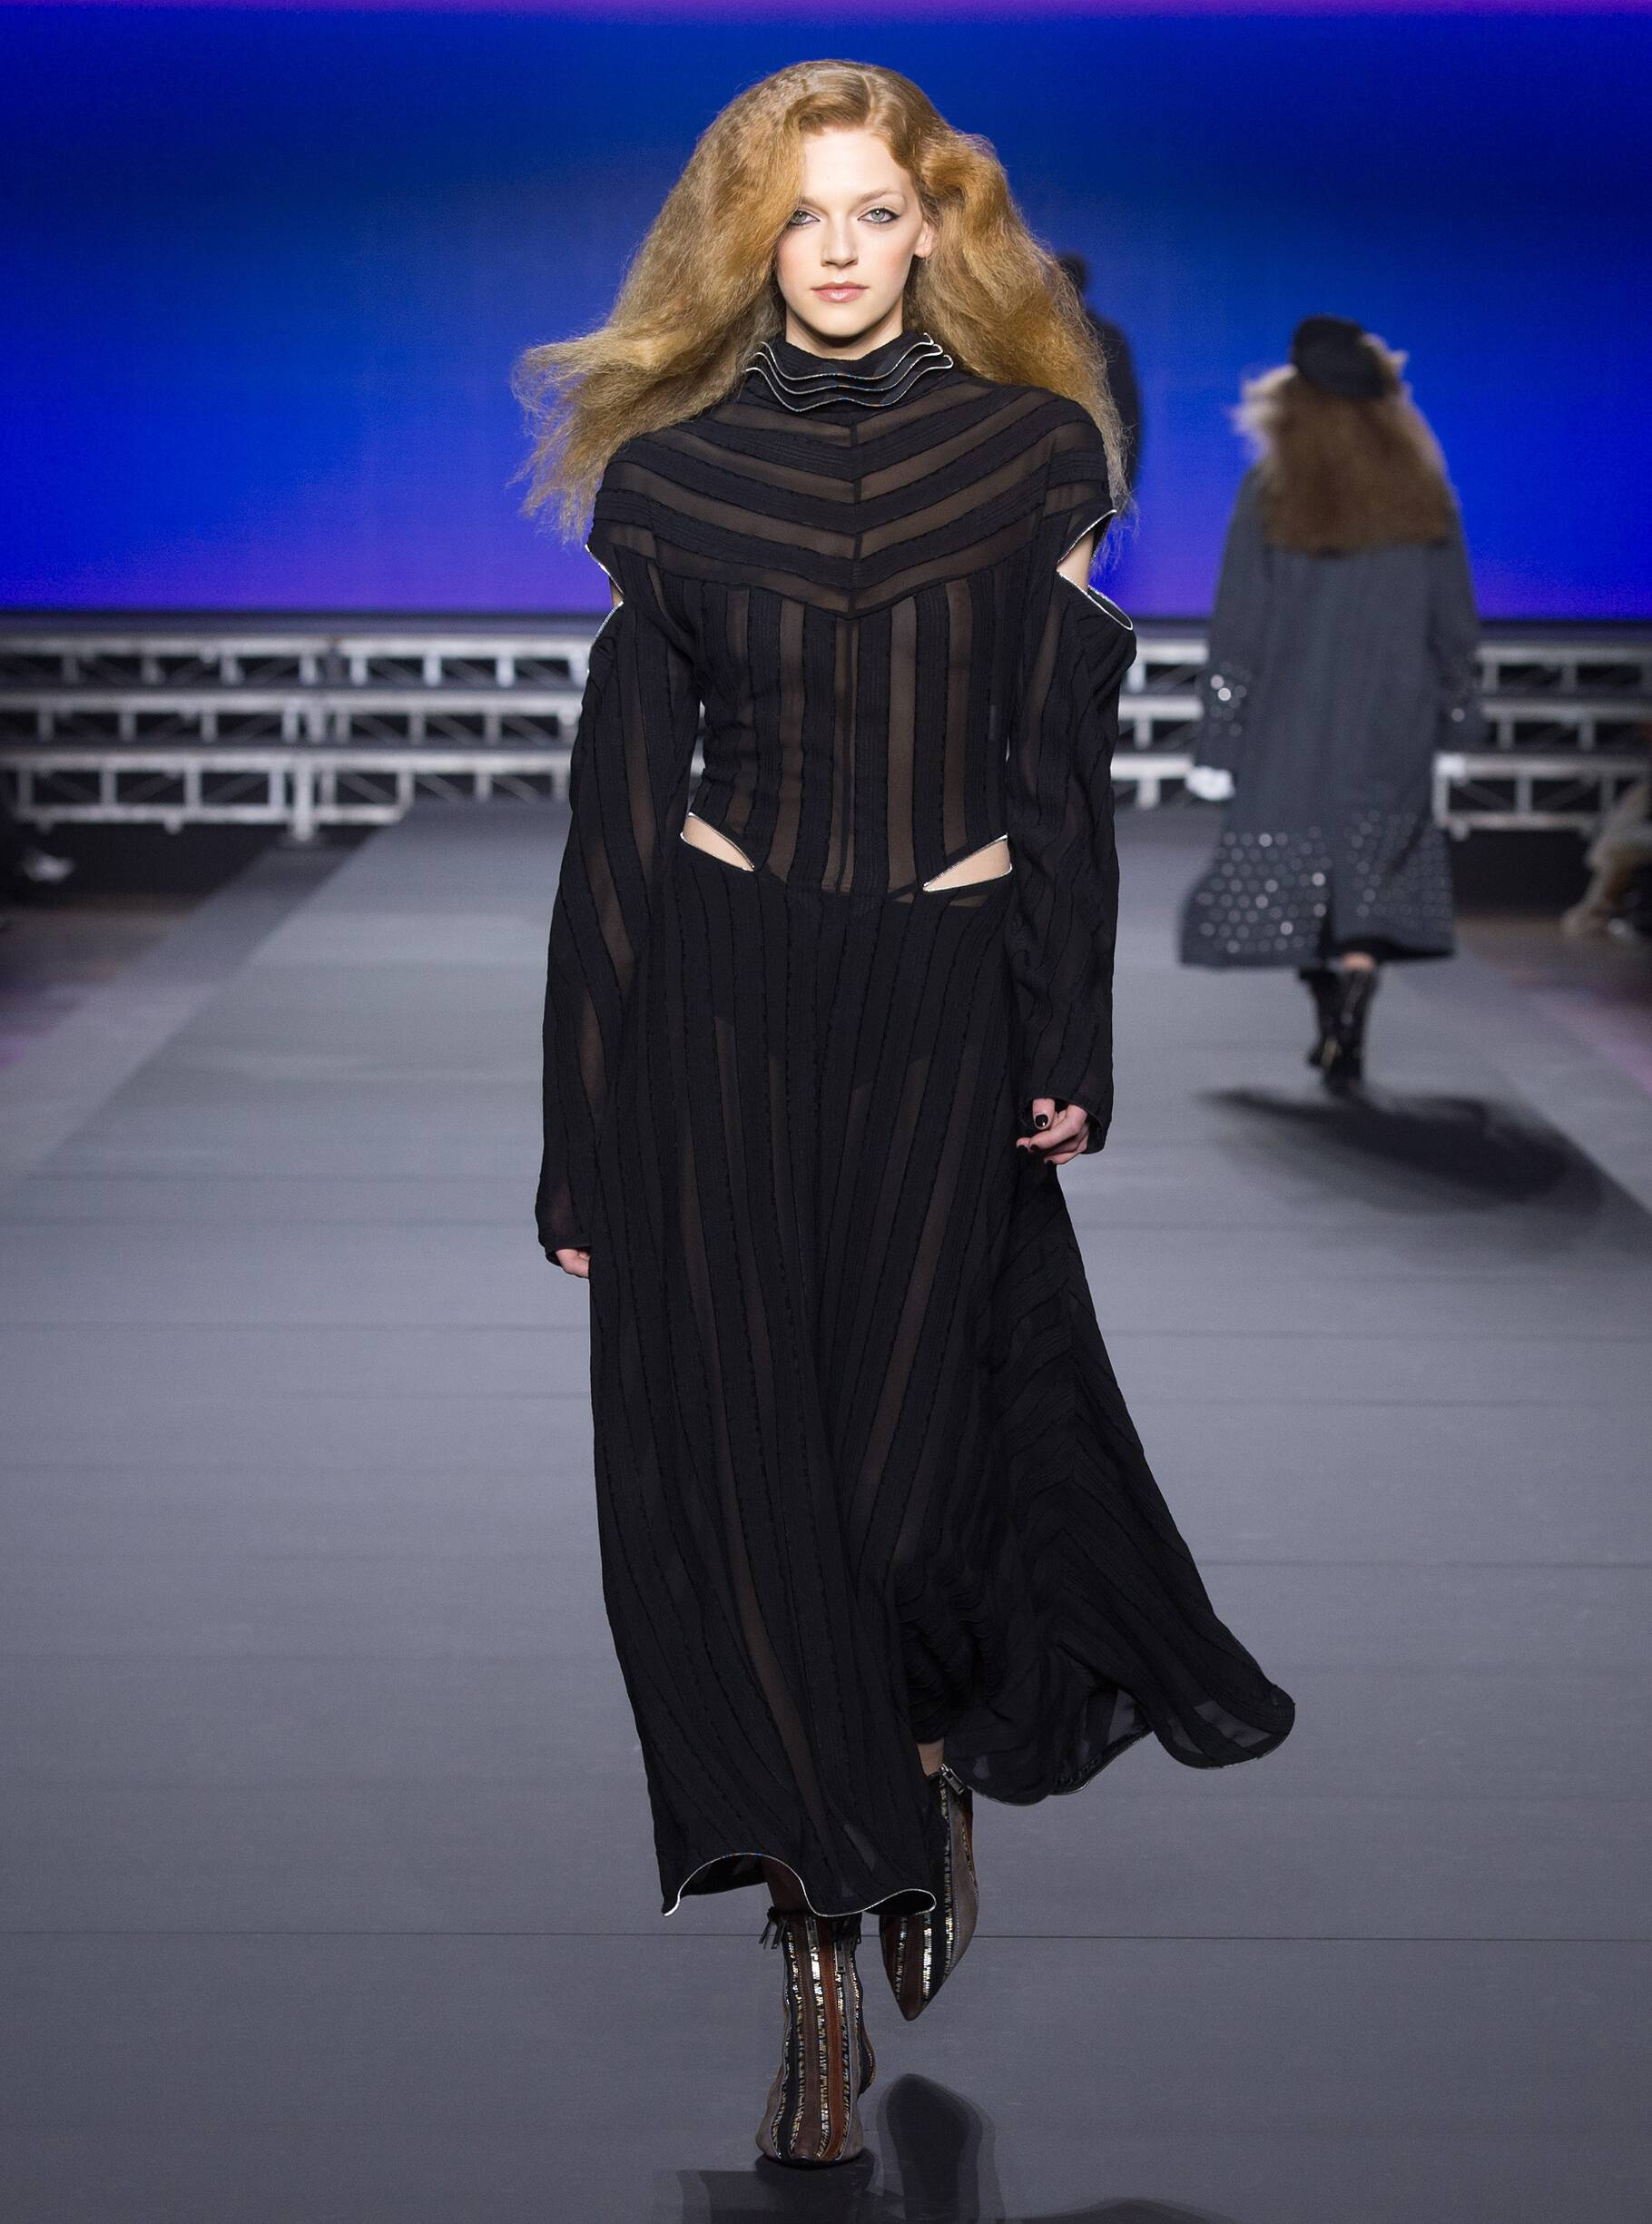 Runway Sonia Rykiel Fall Winter 2018 Women's Collection Paris Fashion Week